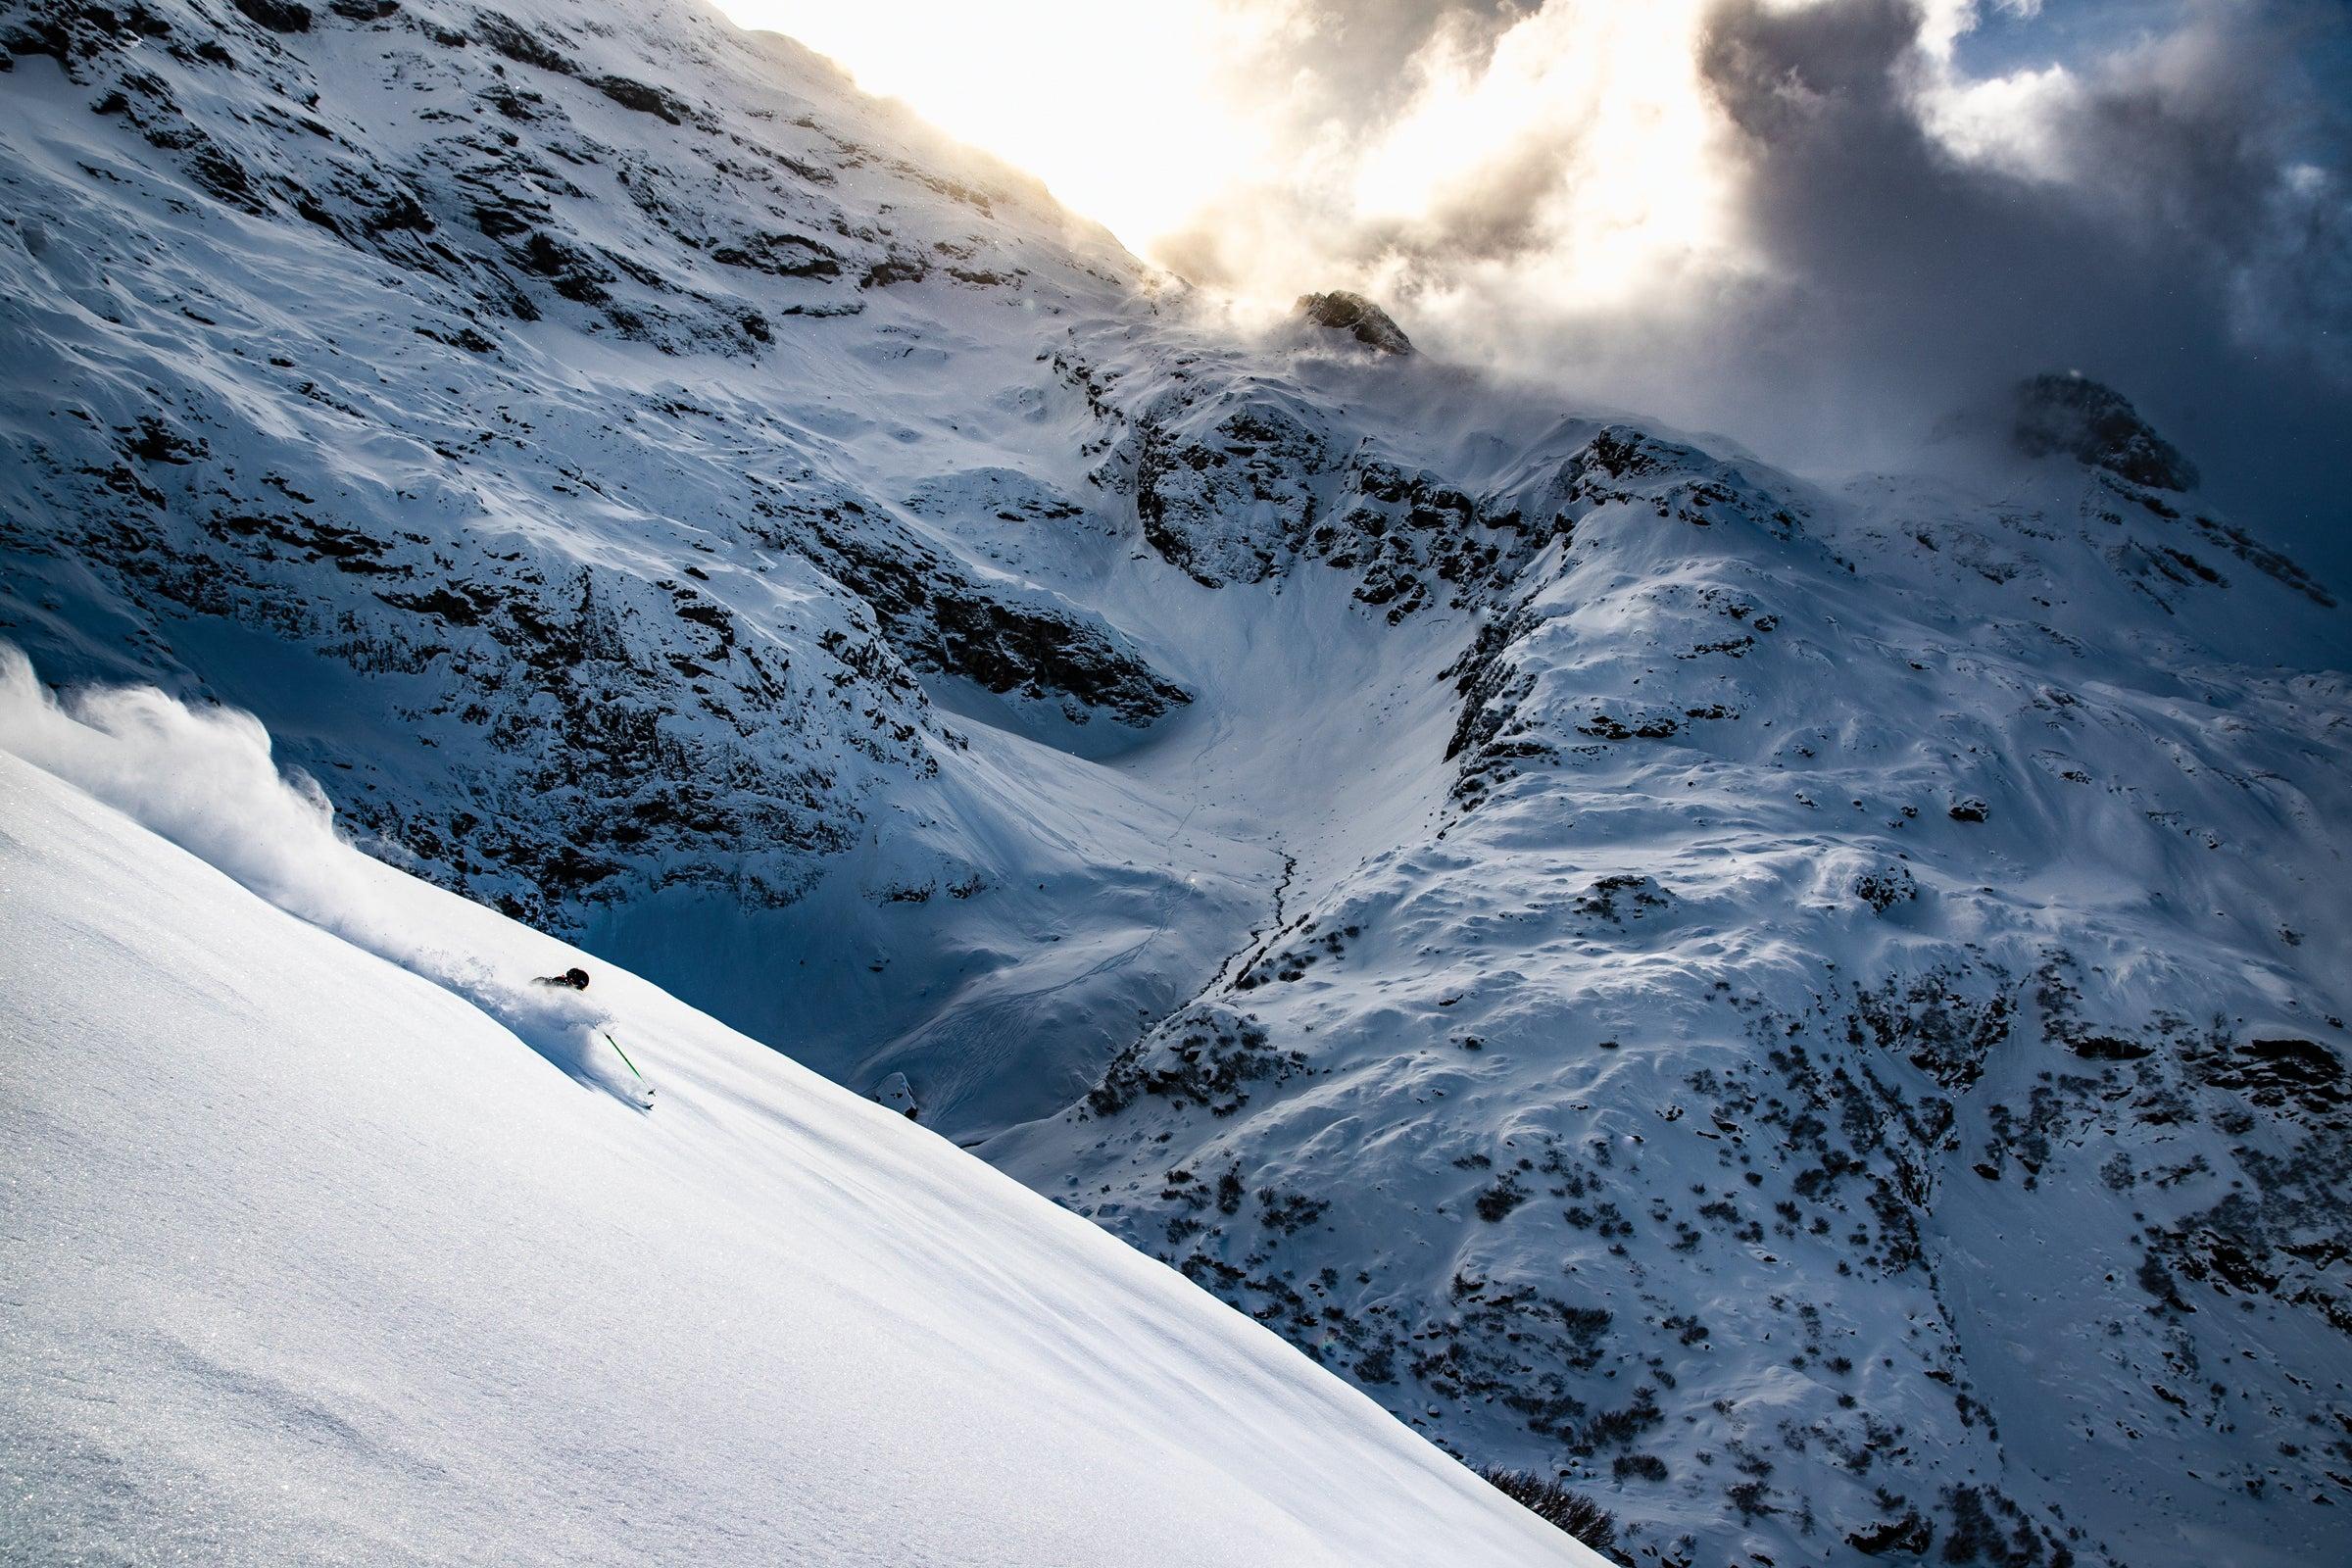 the nearly empty slopes of Engelberg, Switzerland